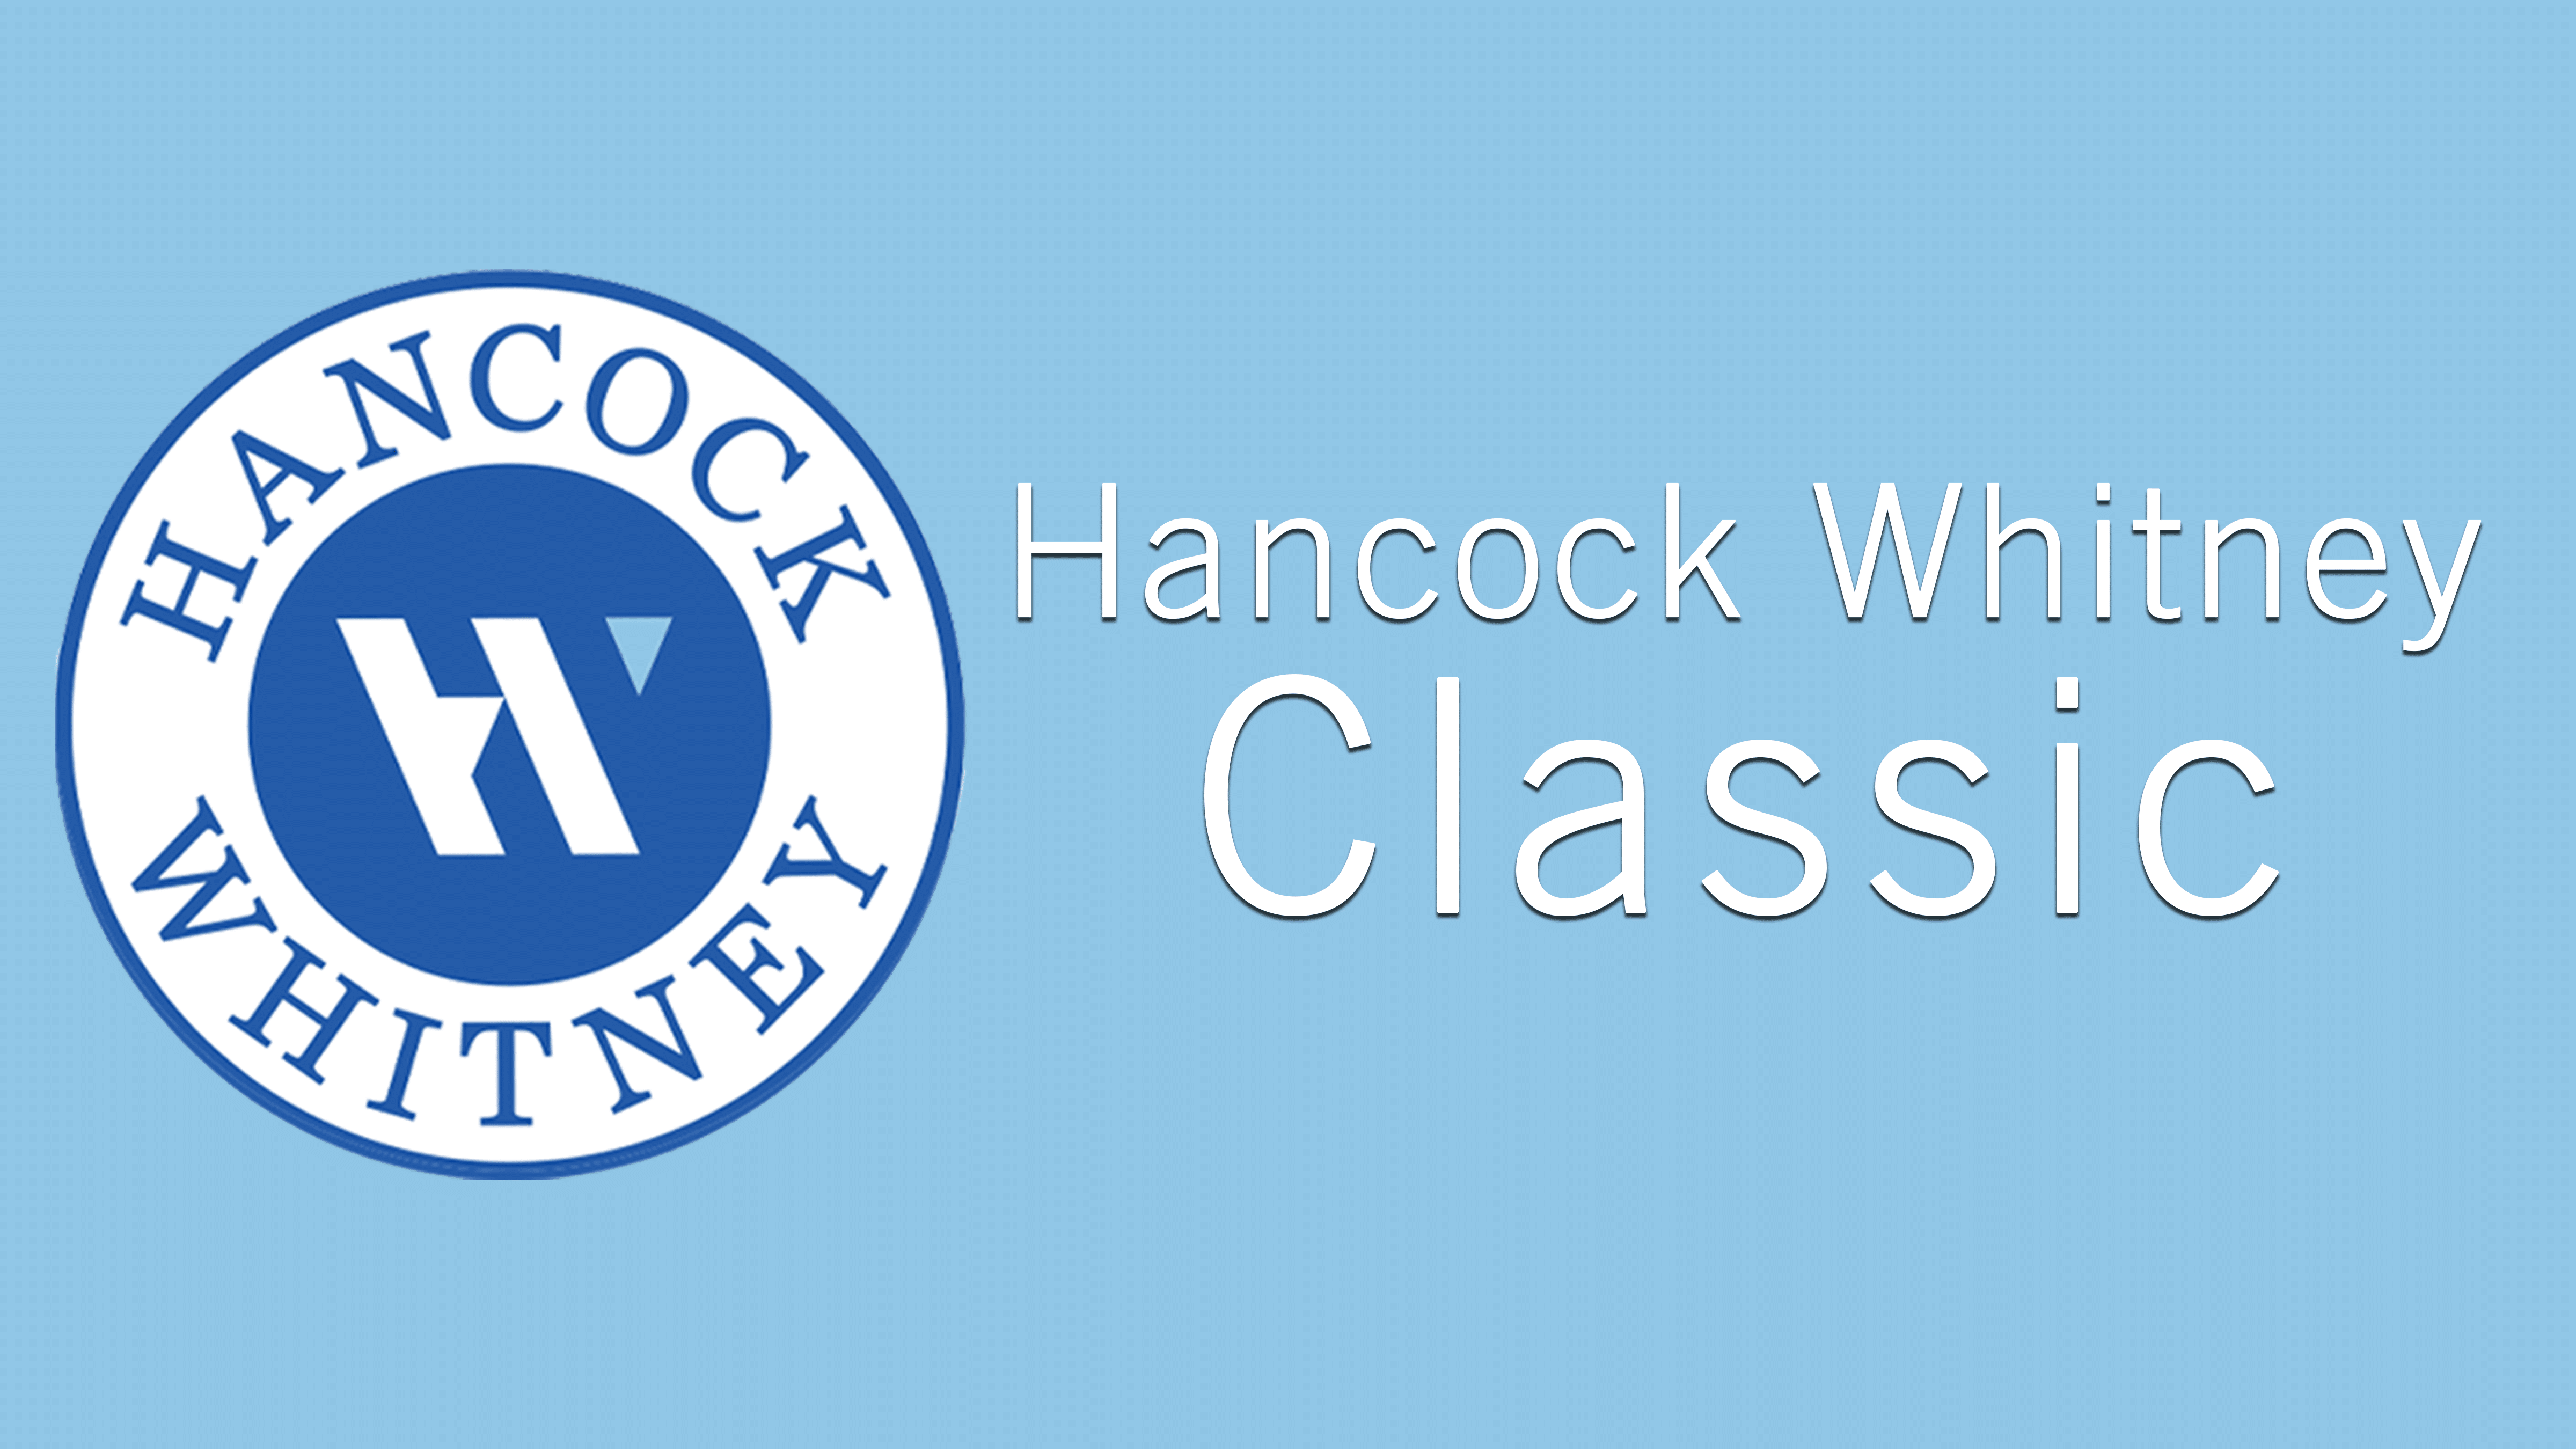 Hancock Whintey Classic Graphic 16x9